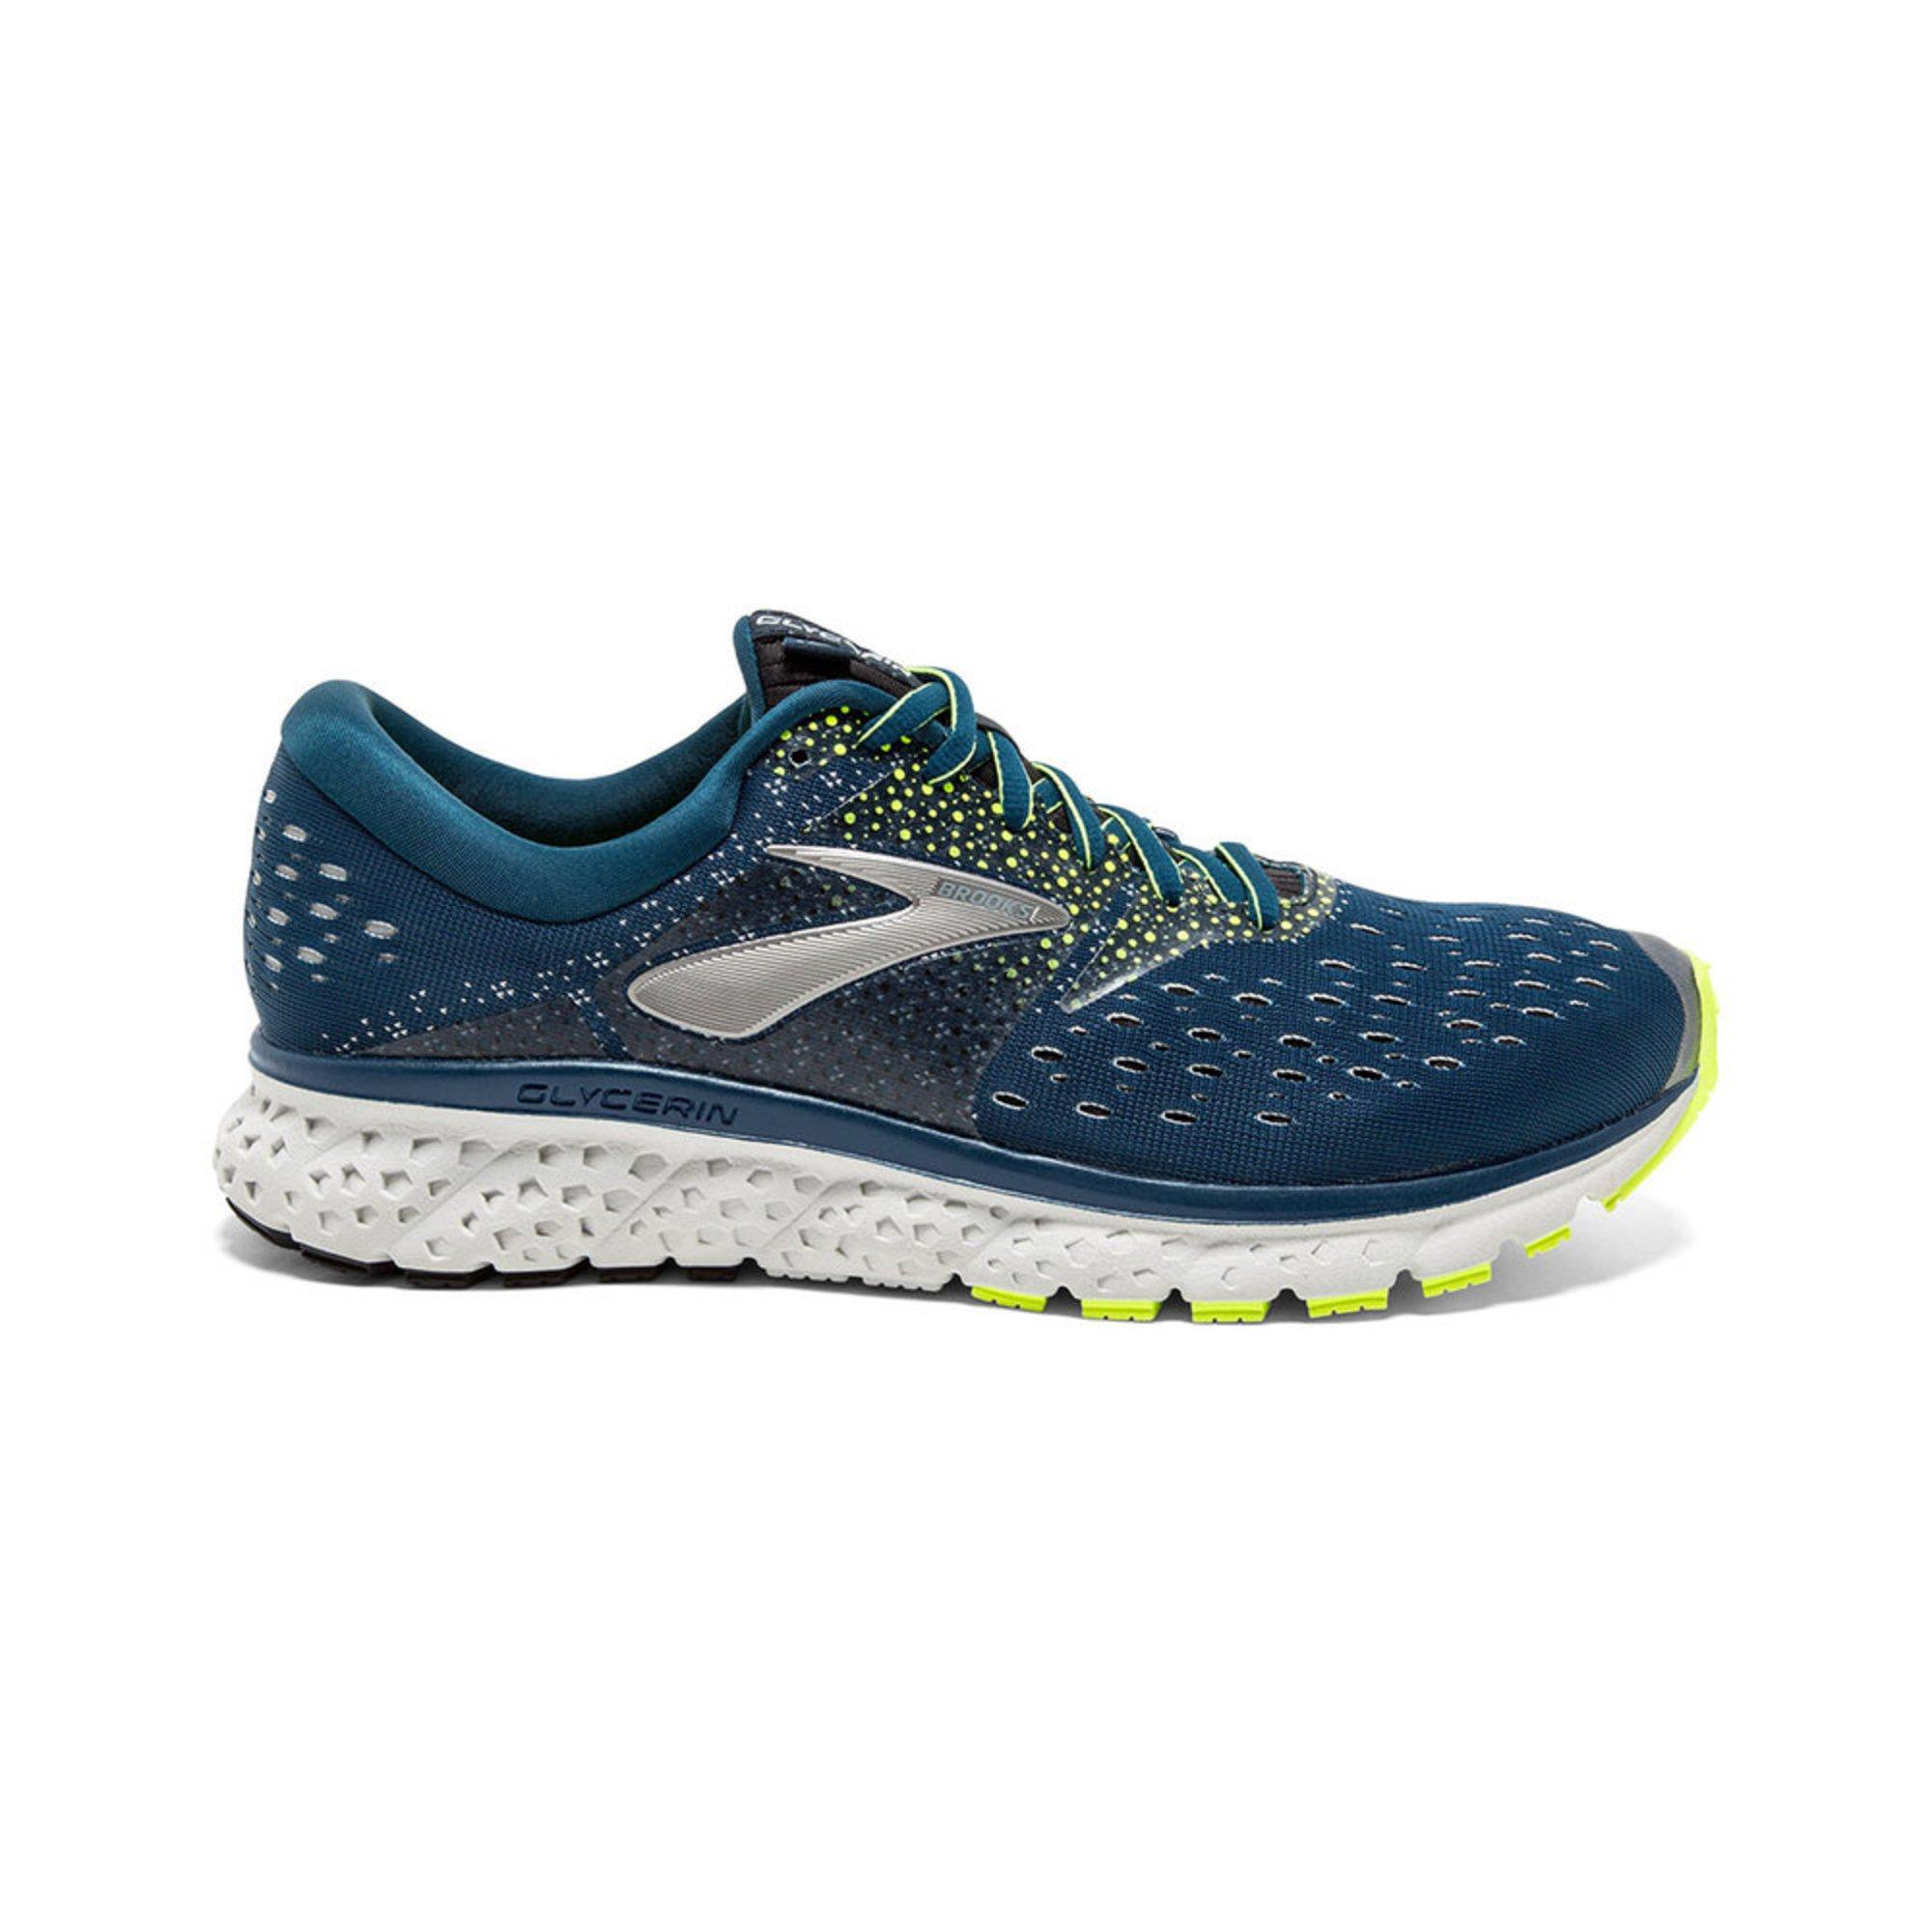 9aceffd81a4 Brooks Men s Glycerin 16 Running Shoe